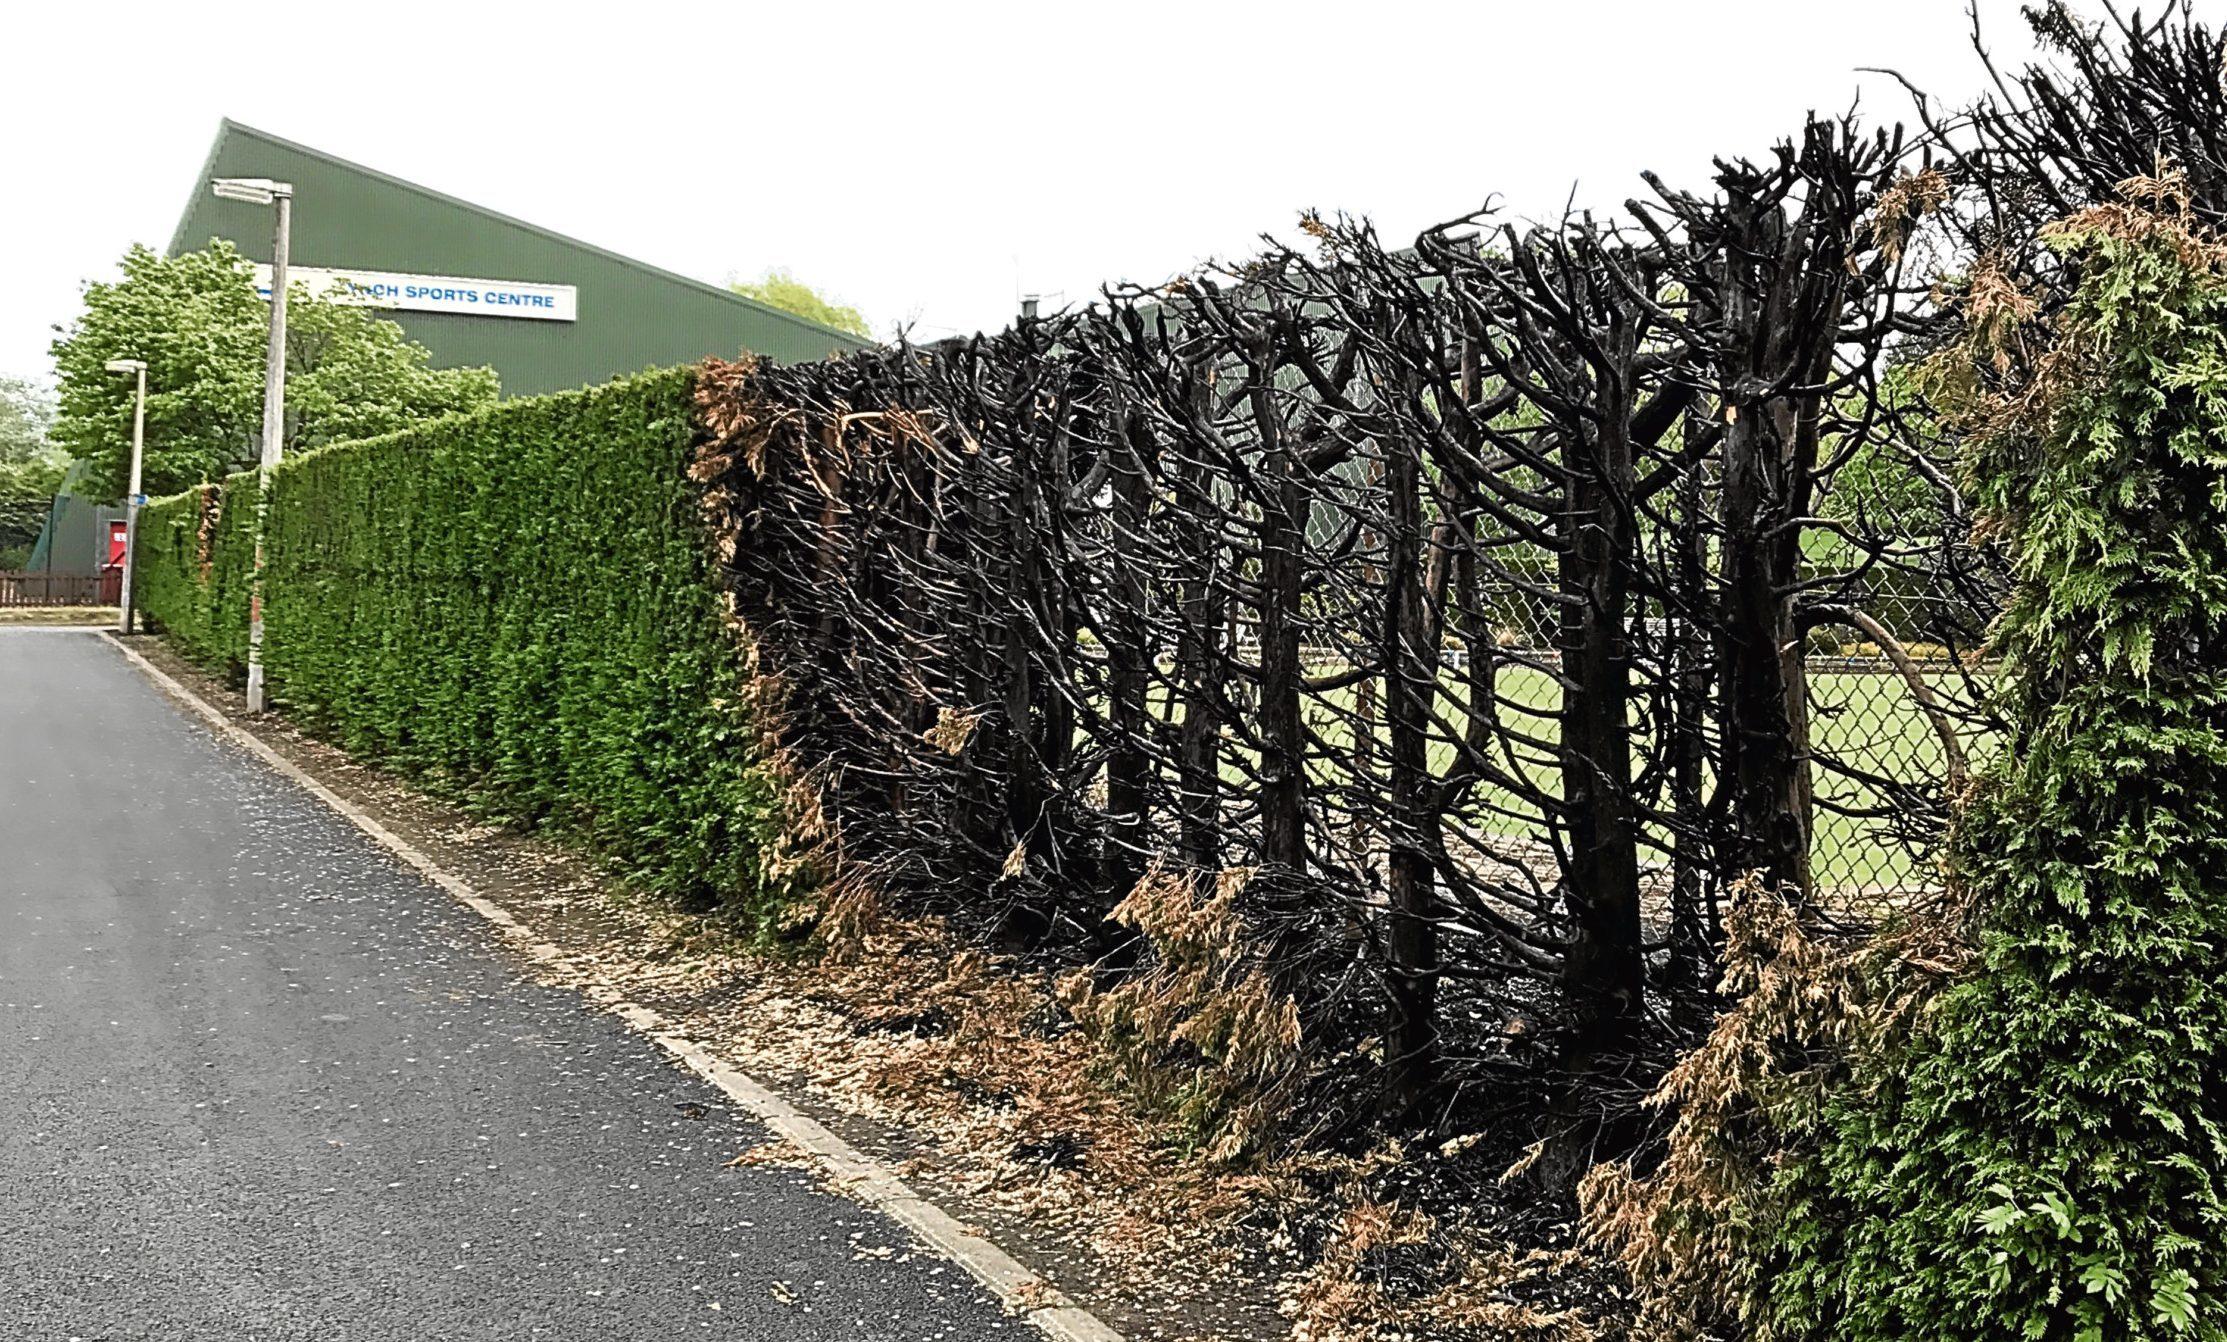 Fire-damaged fence